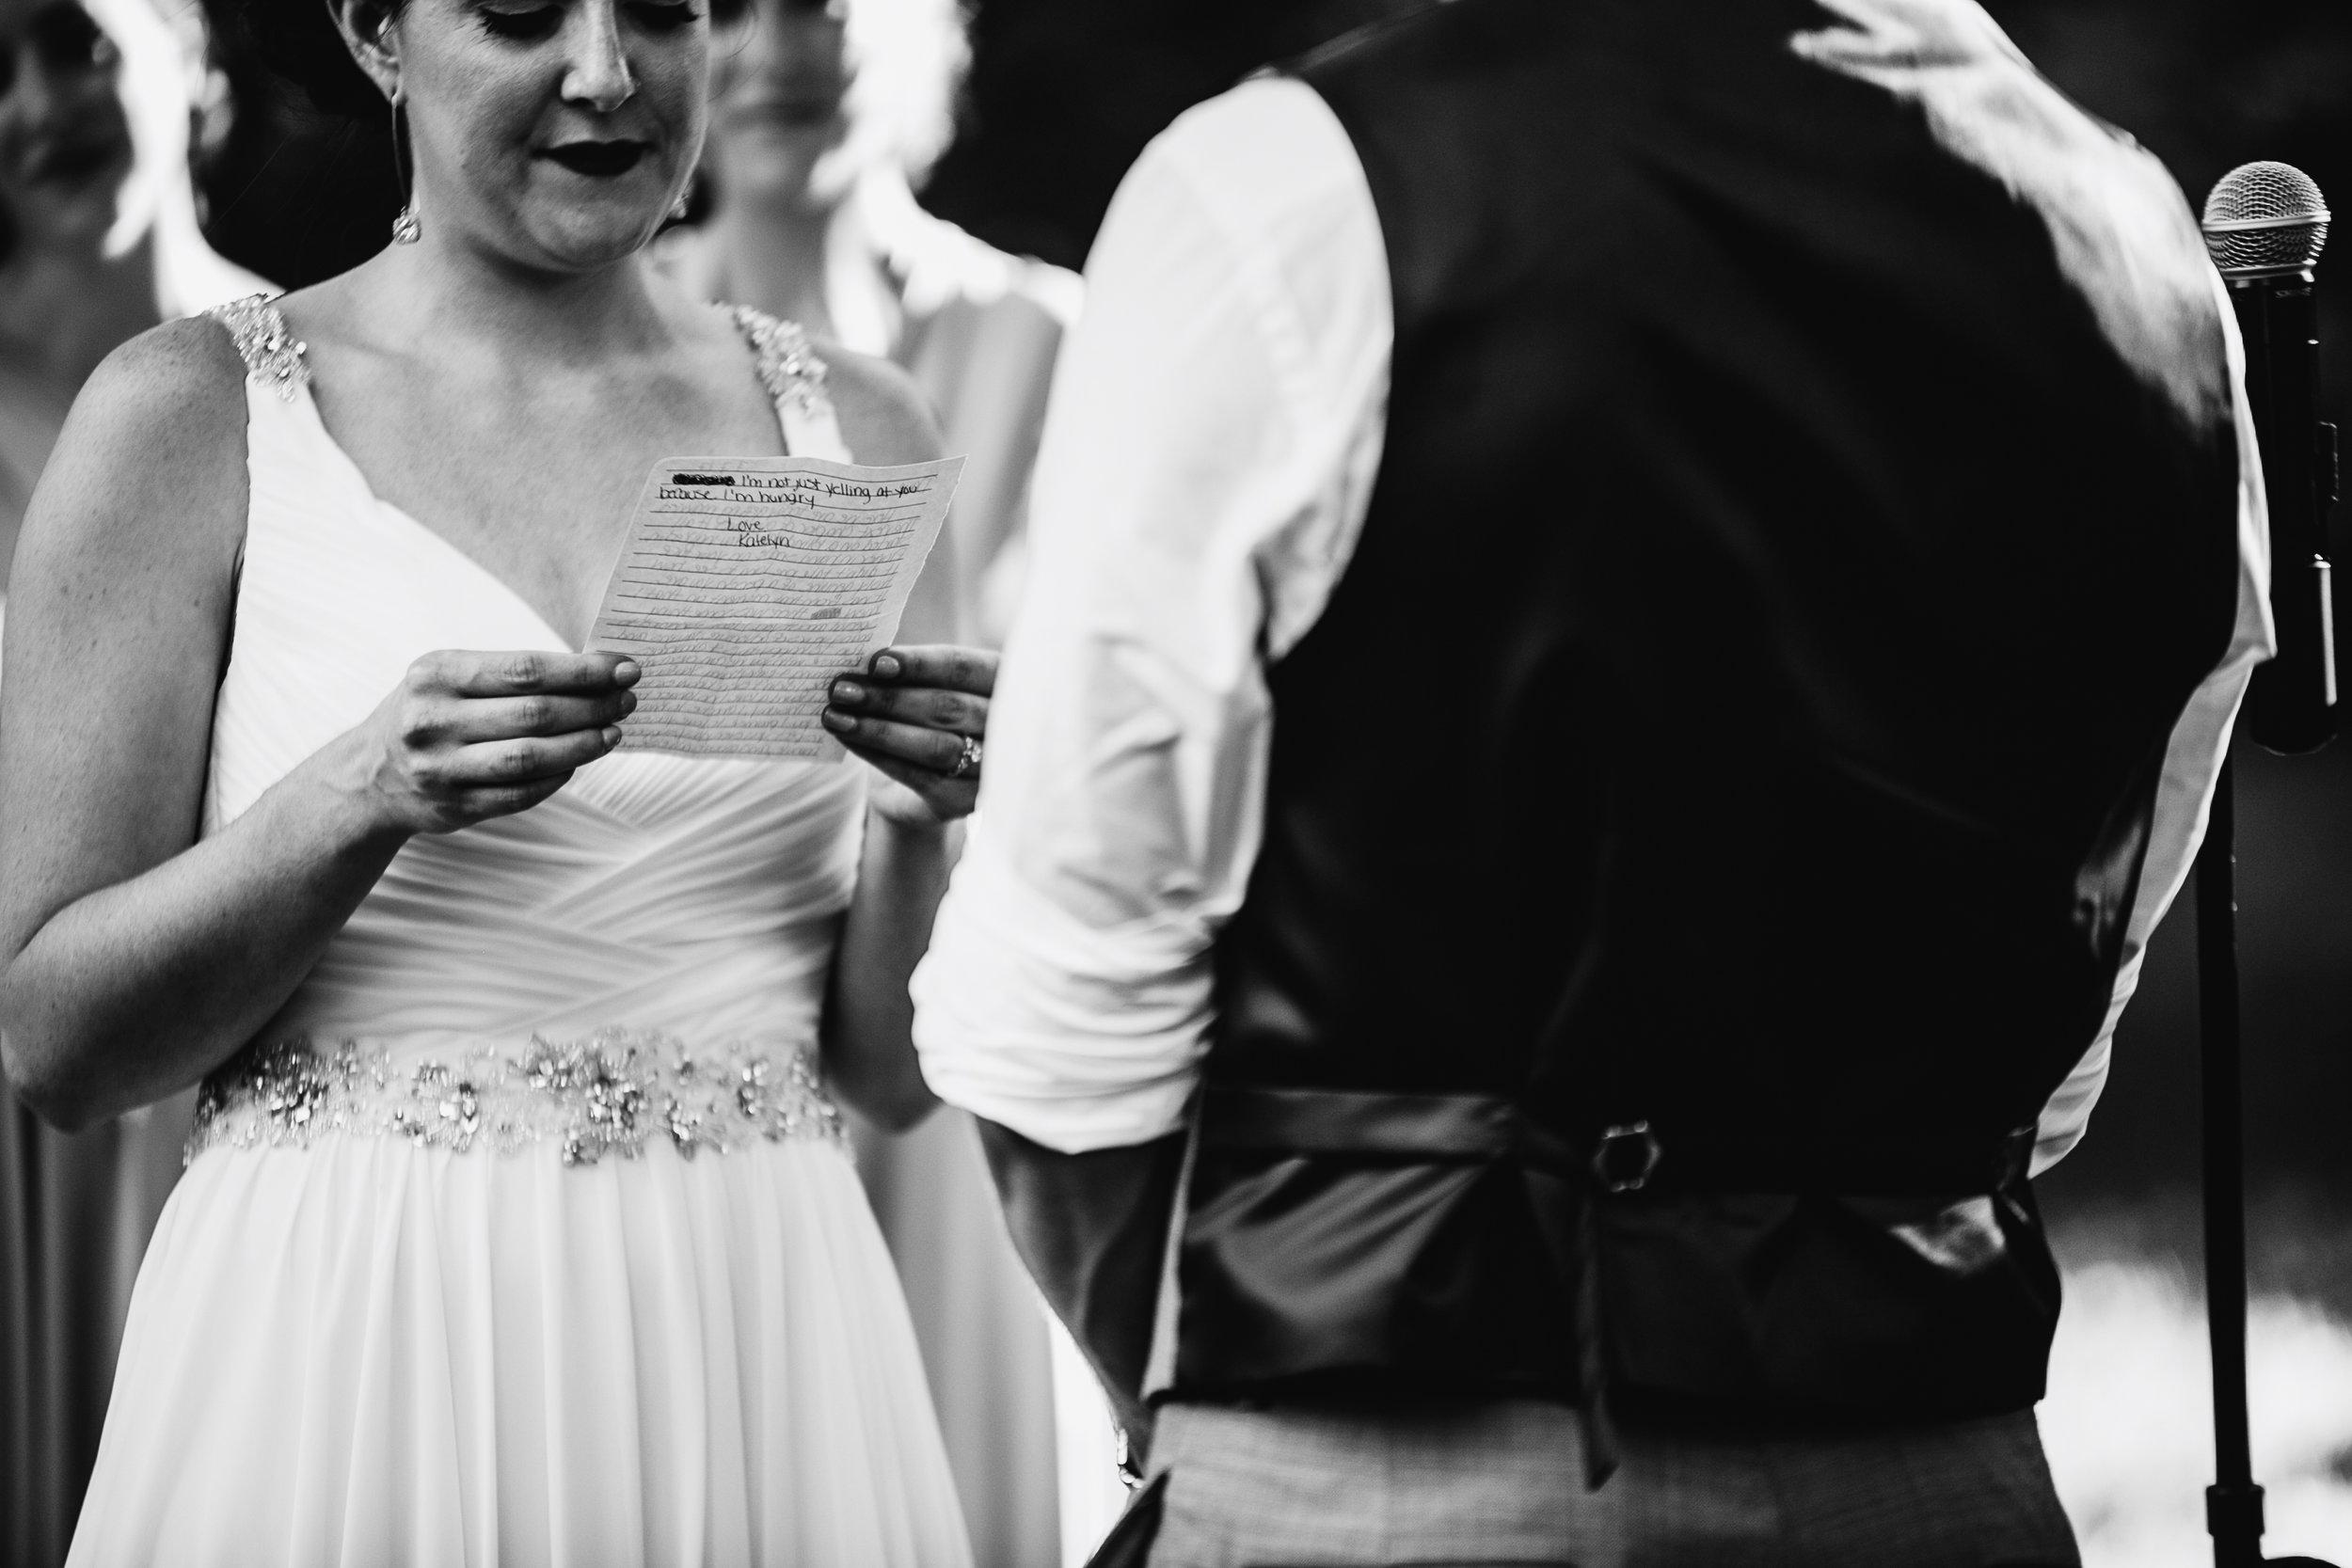 TYLER ARBORETUM WEDDING PHOTOGRAPHY LOVESTRUCK PICTURES-057.jpg